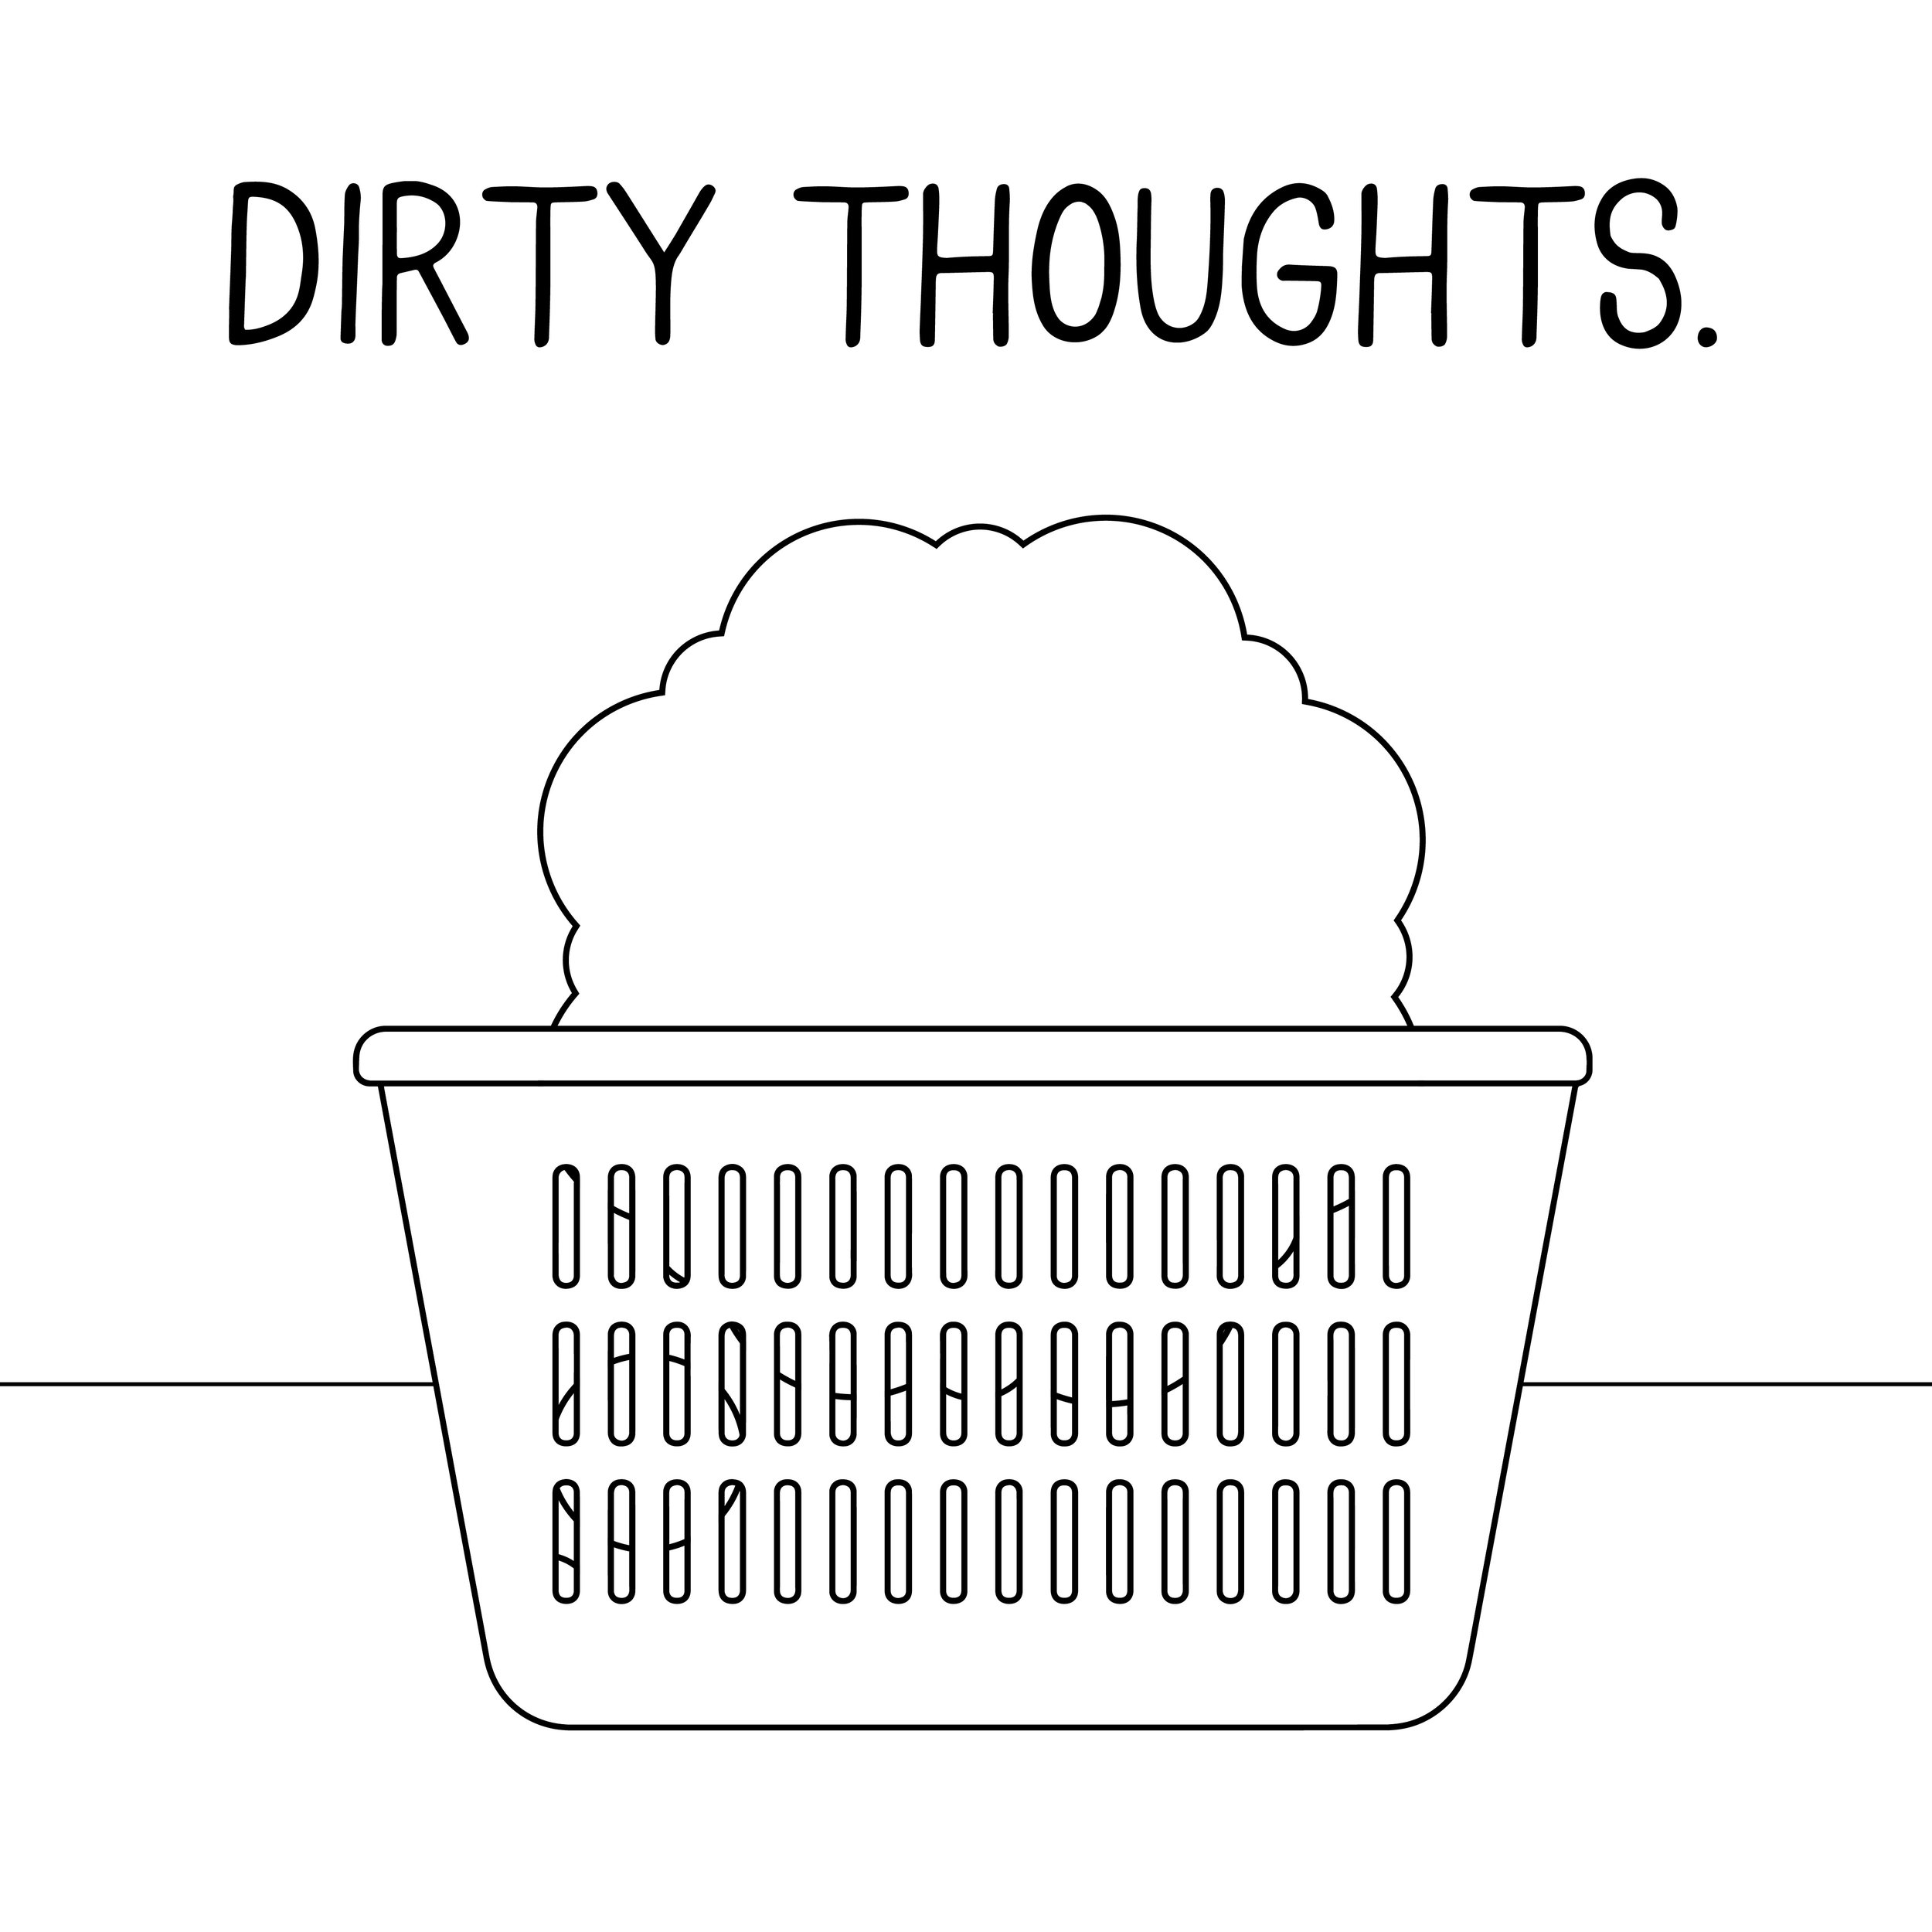 dirtythoughtsbasket-01.jpg